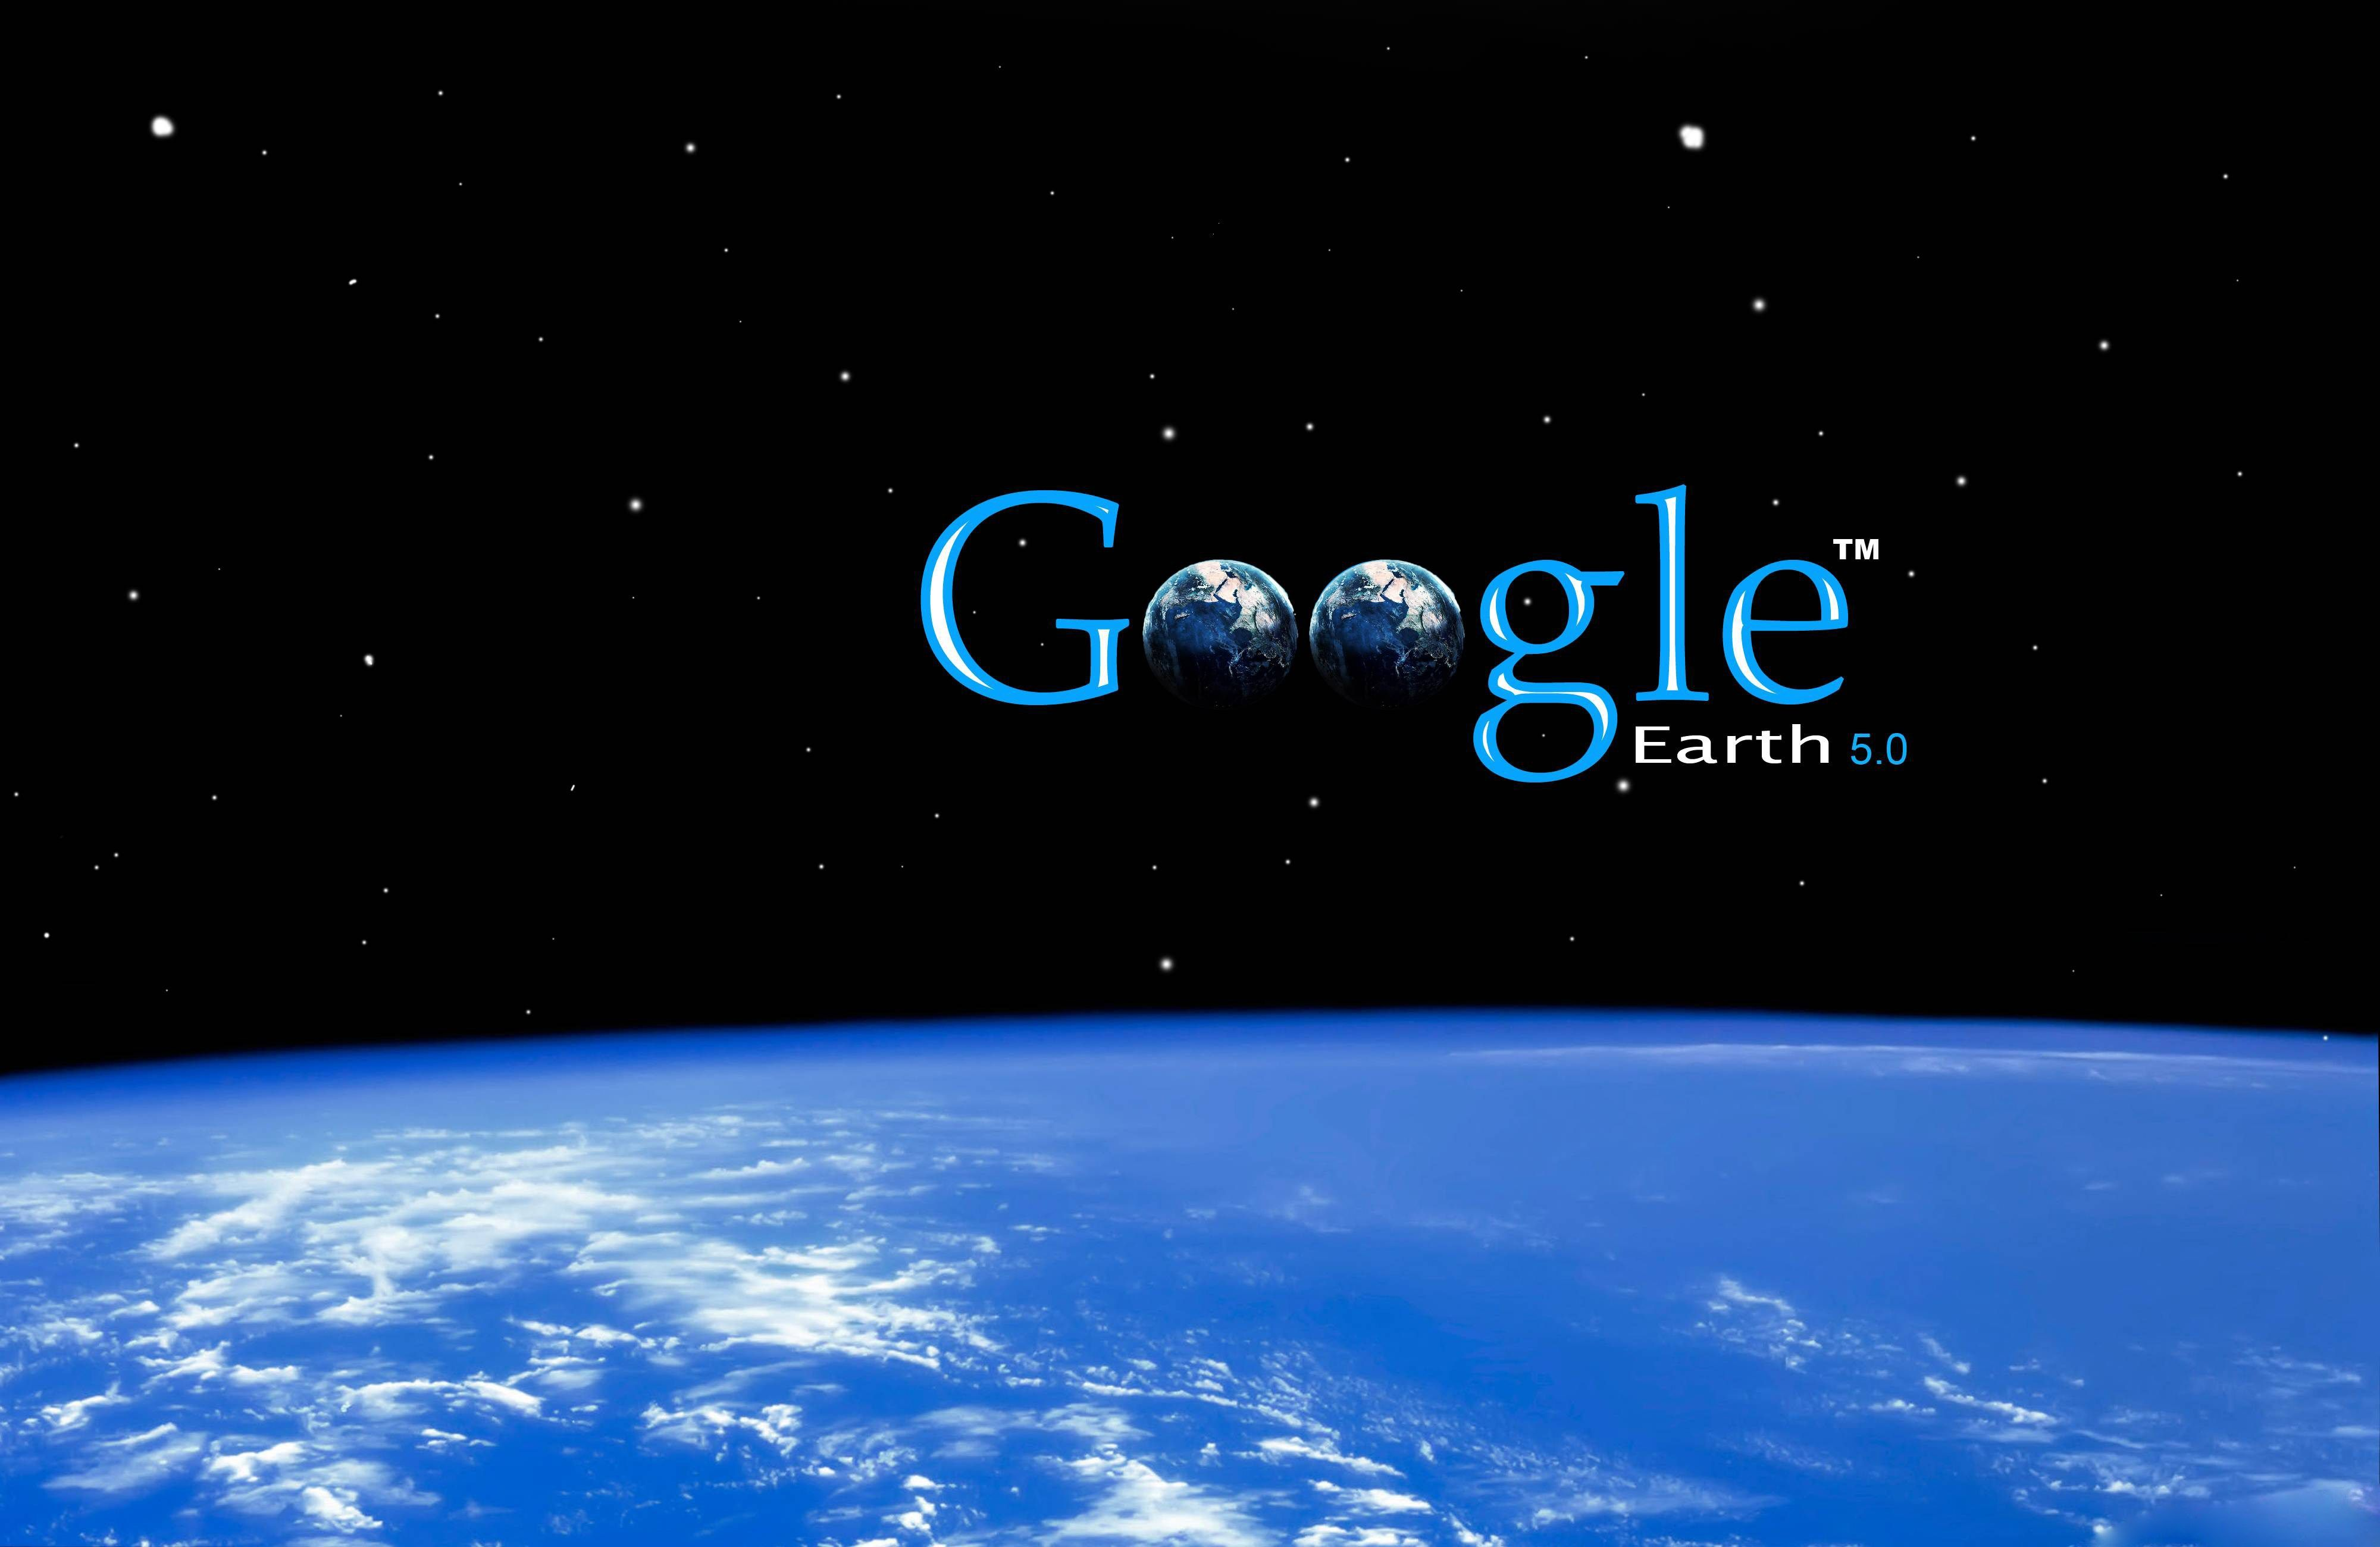 Google hd wallpaper download large high resolution desktop theme